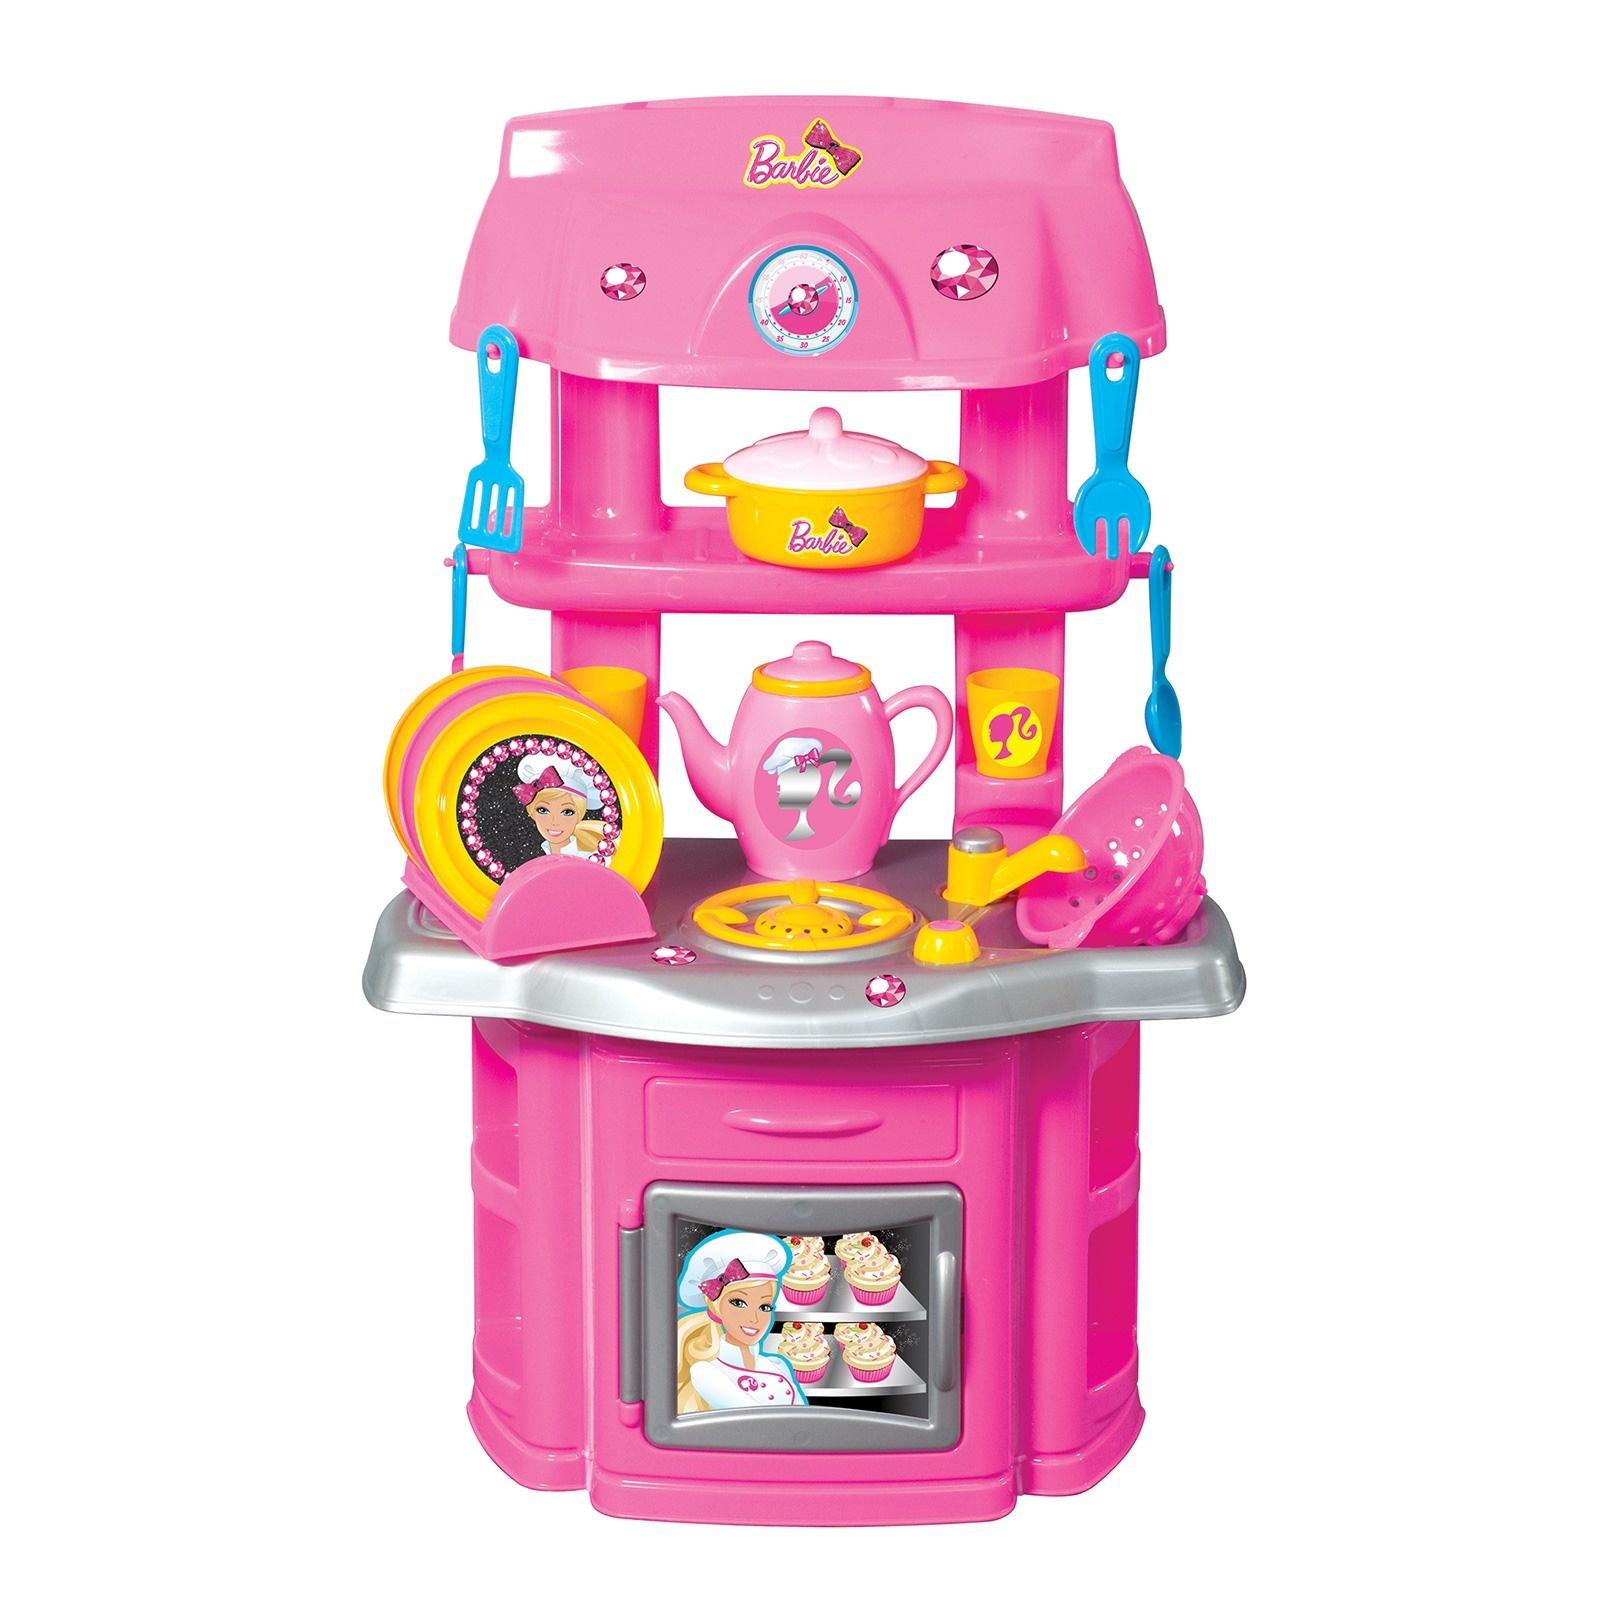 Dede barbie chef kitchen set